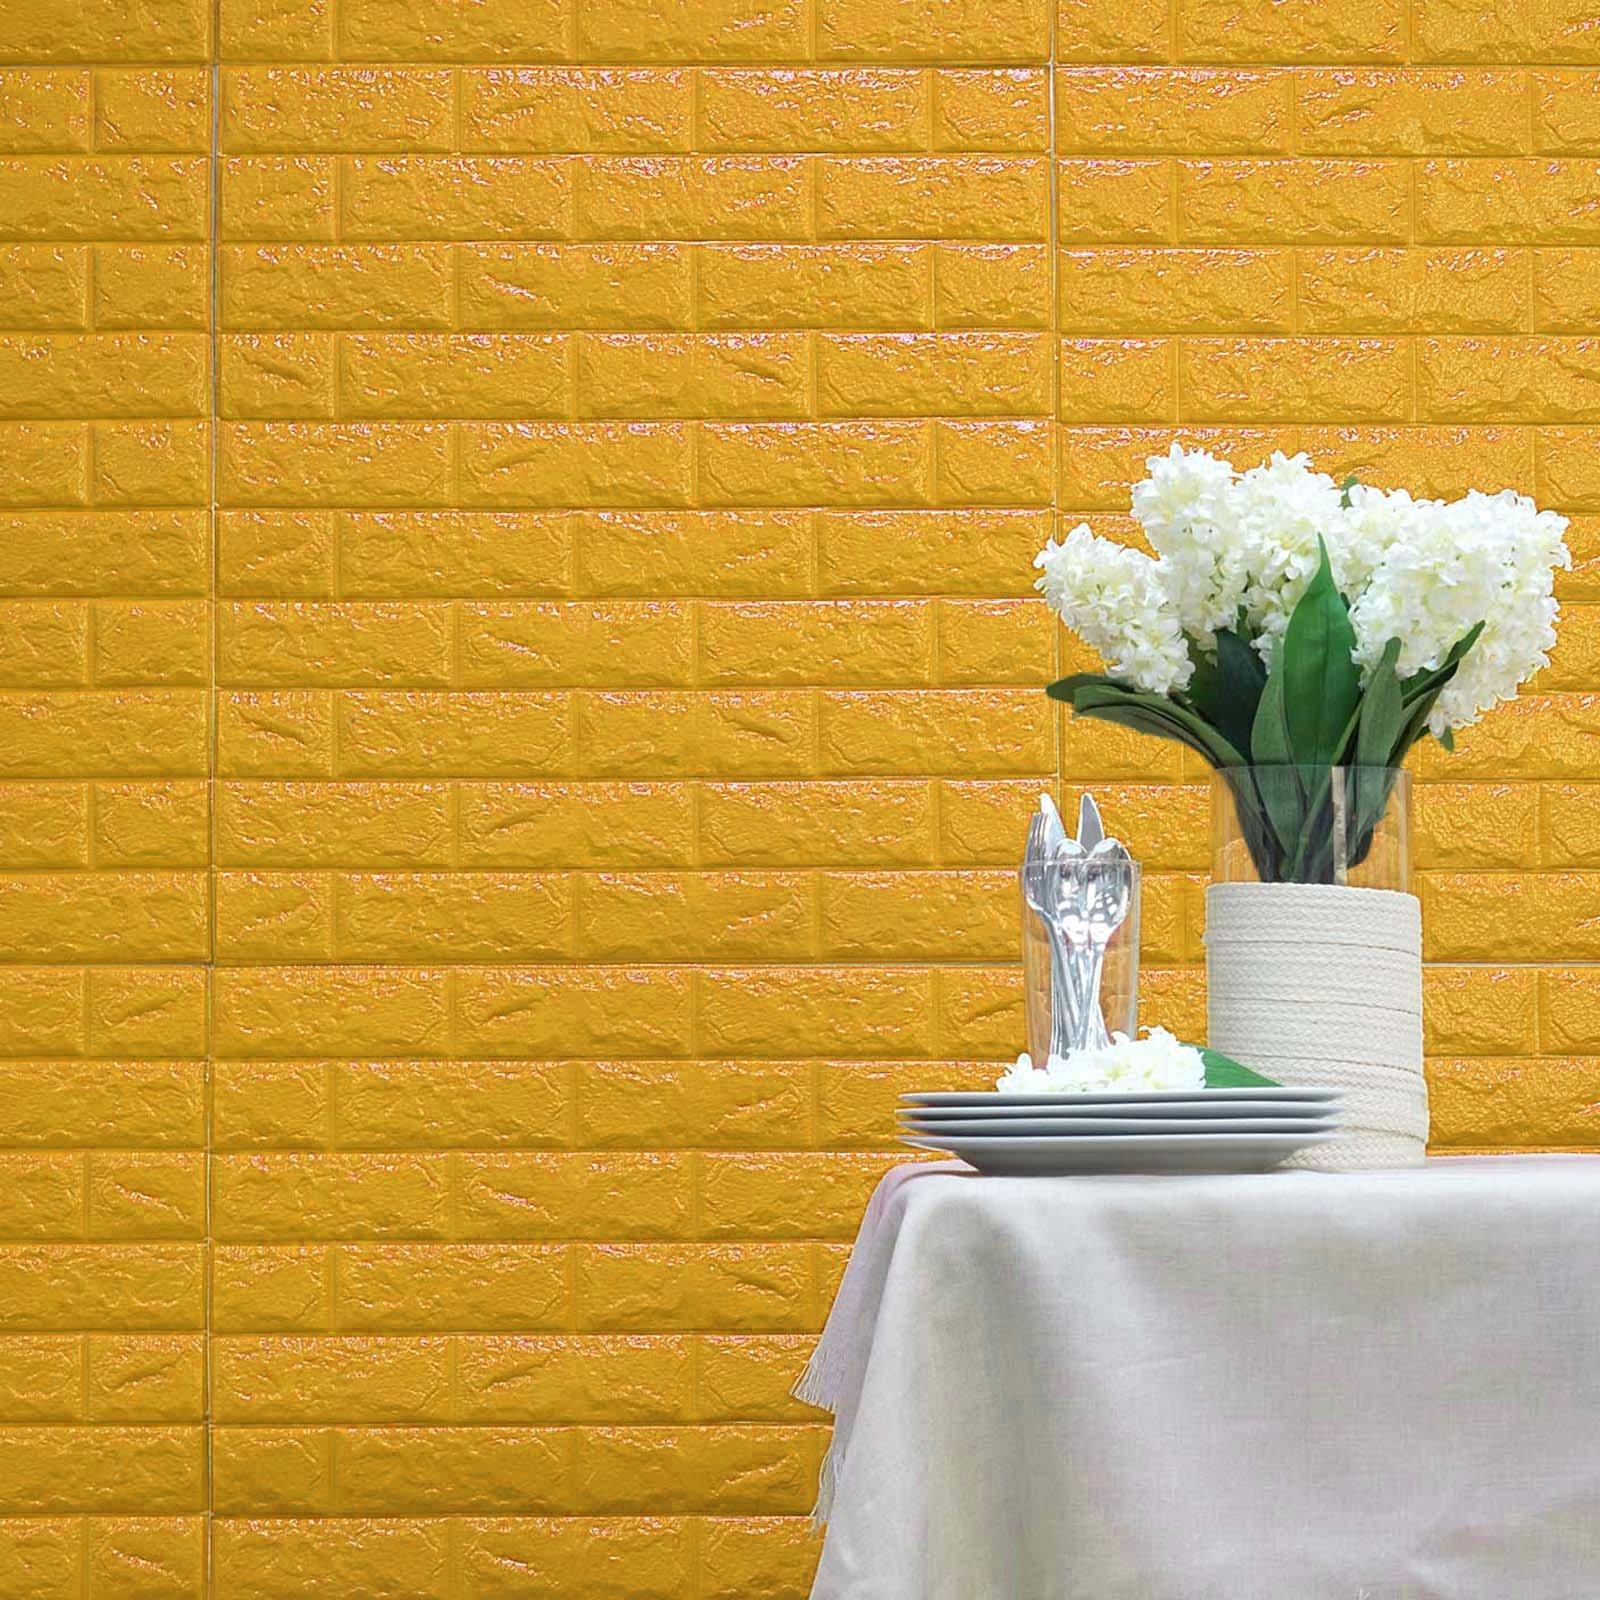 "BalsaCircle 10 pcs 33"" wide Faux Brick Texture Waterproof Foam Wall Panels DIY Party Backdrop Kids Room Decorations"